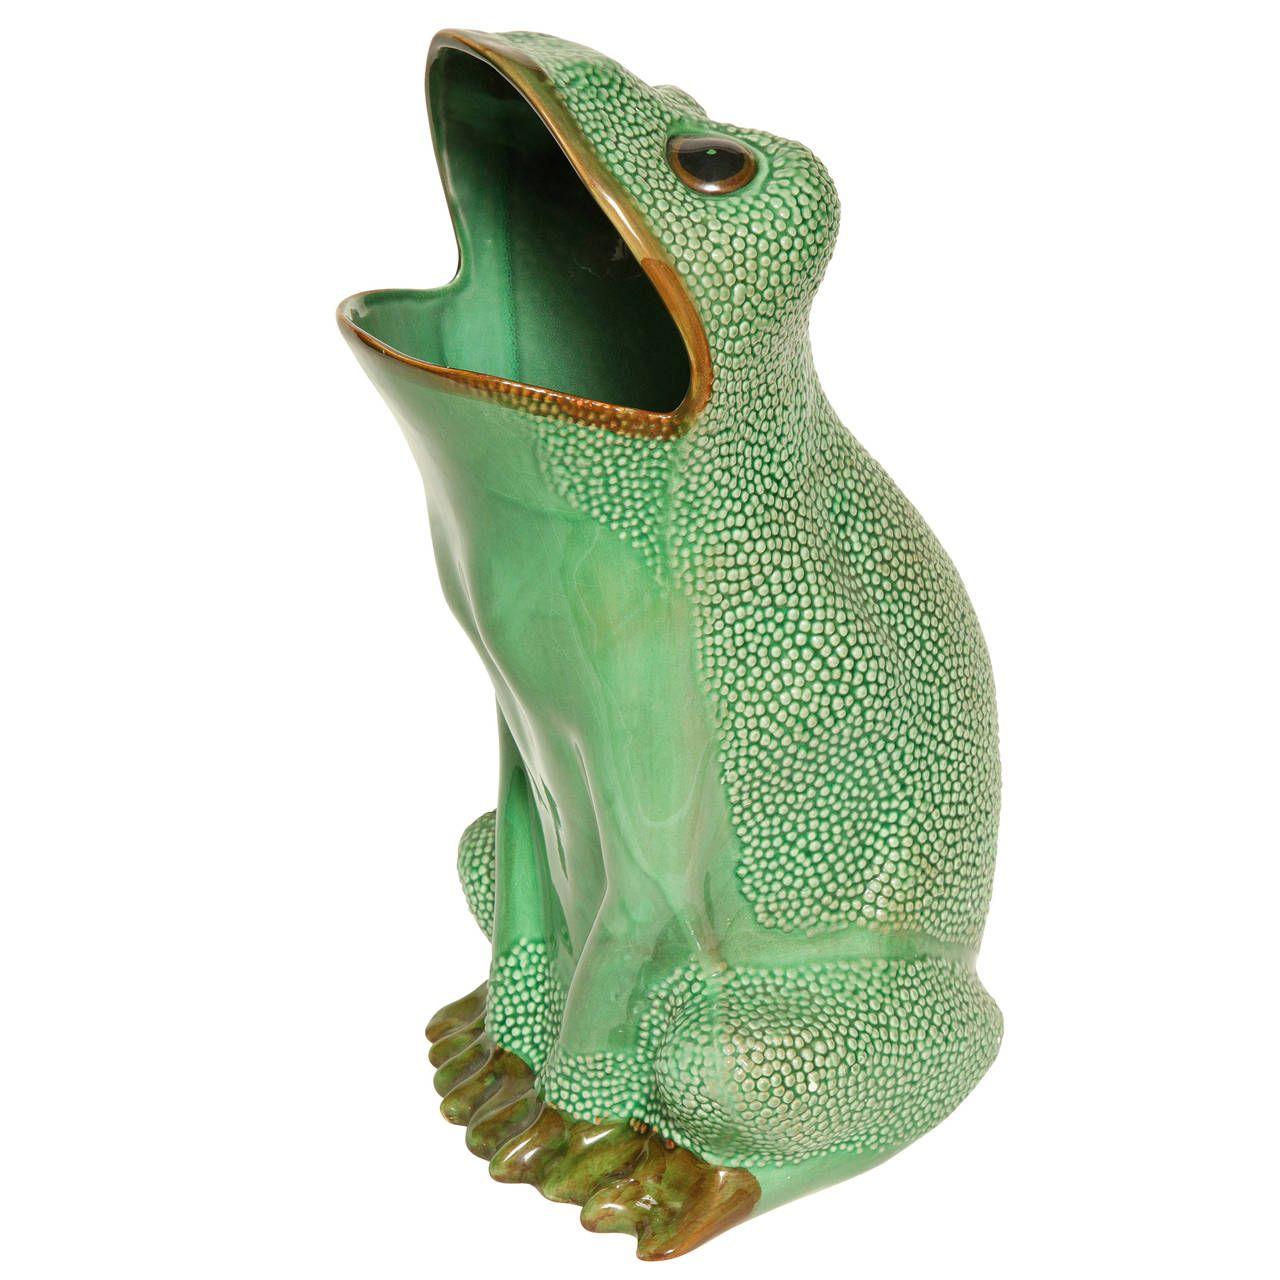 Italian Ceramic Frog Umbrella Stand From a unique